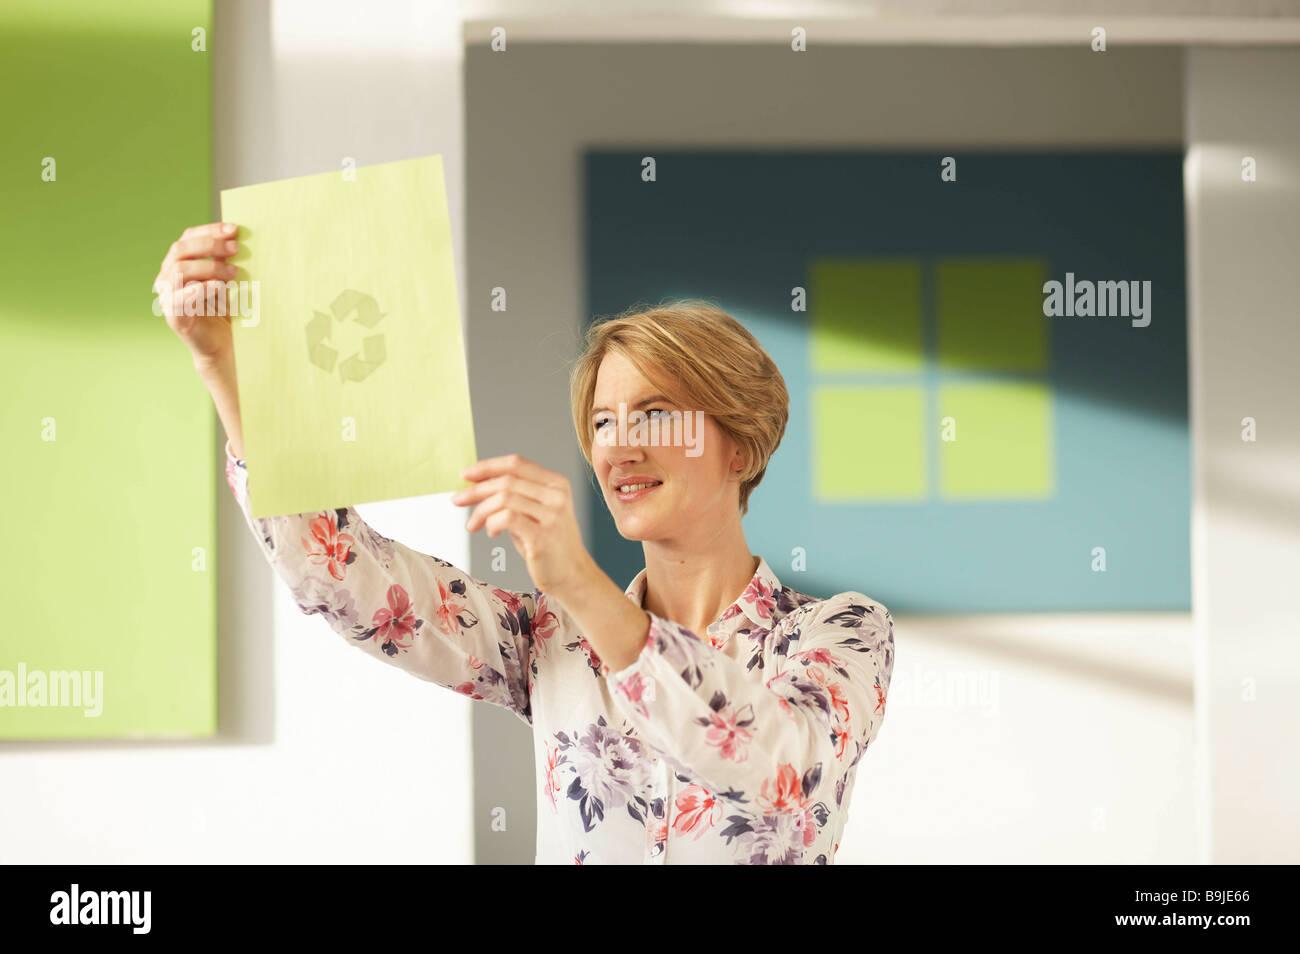 Woman looking at recycling logo - Stock Image